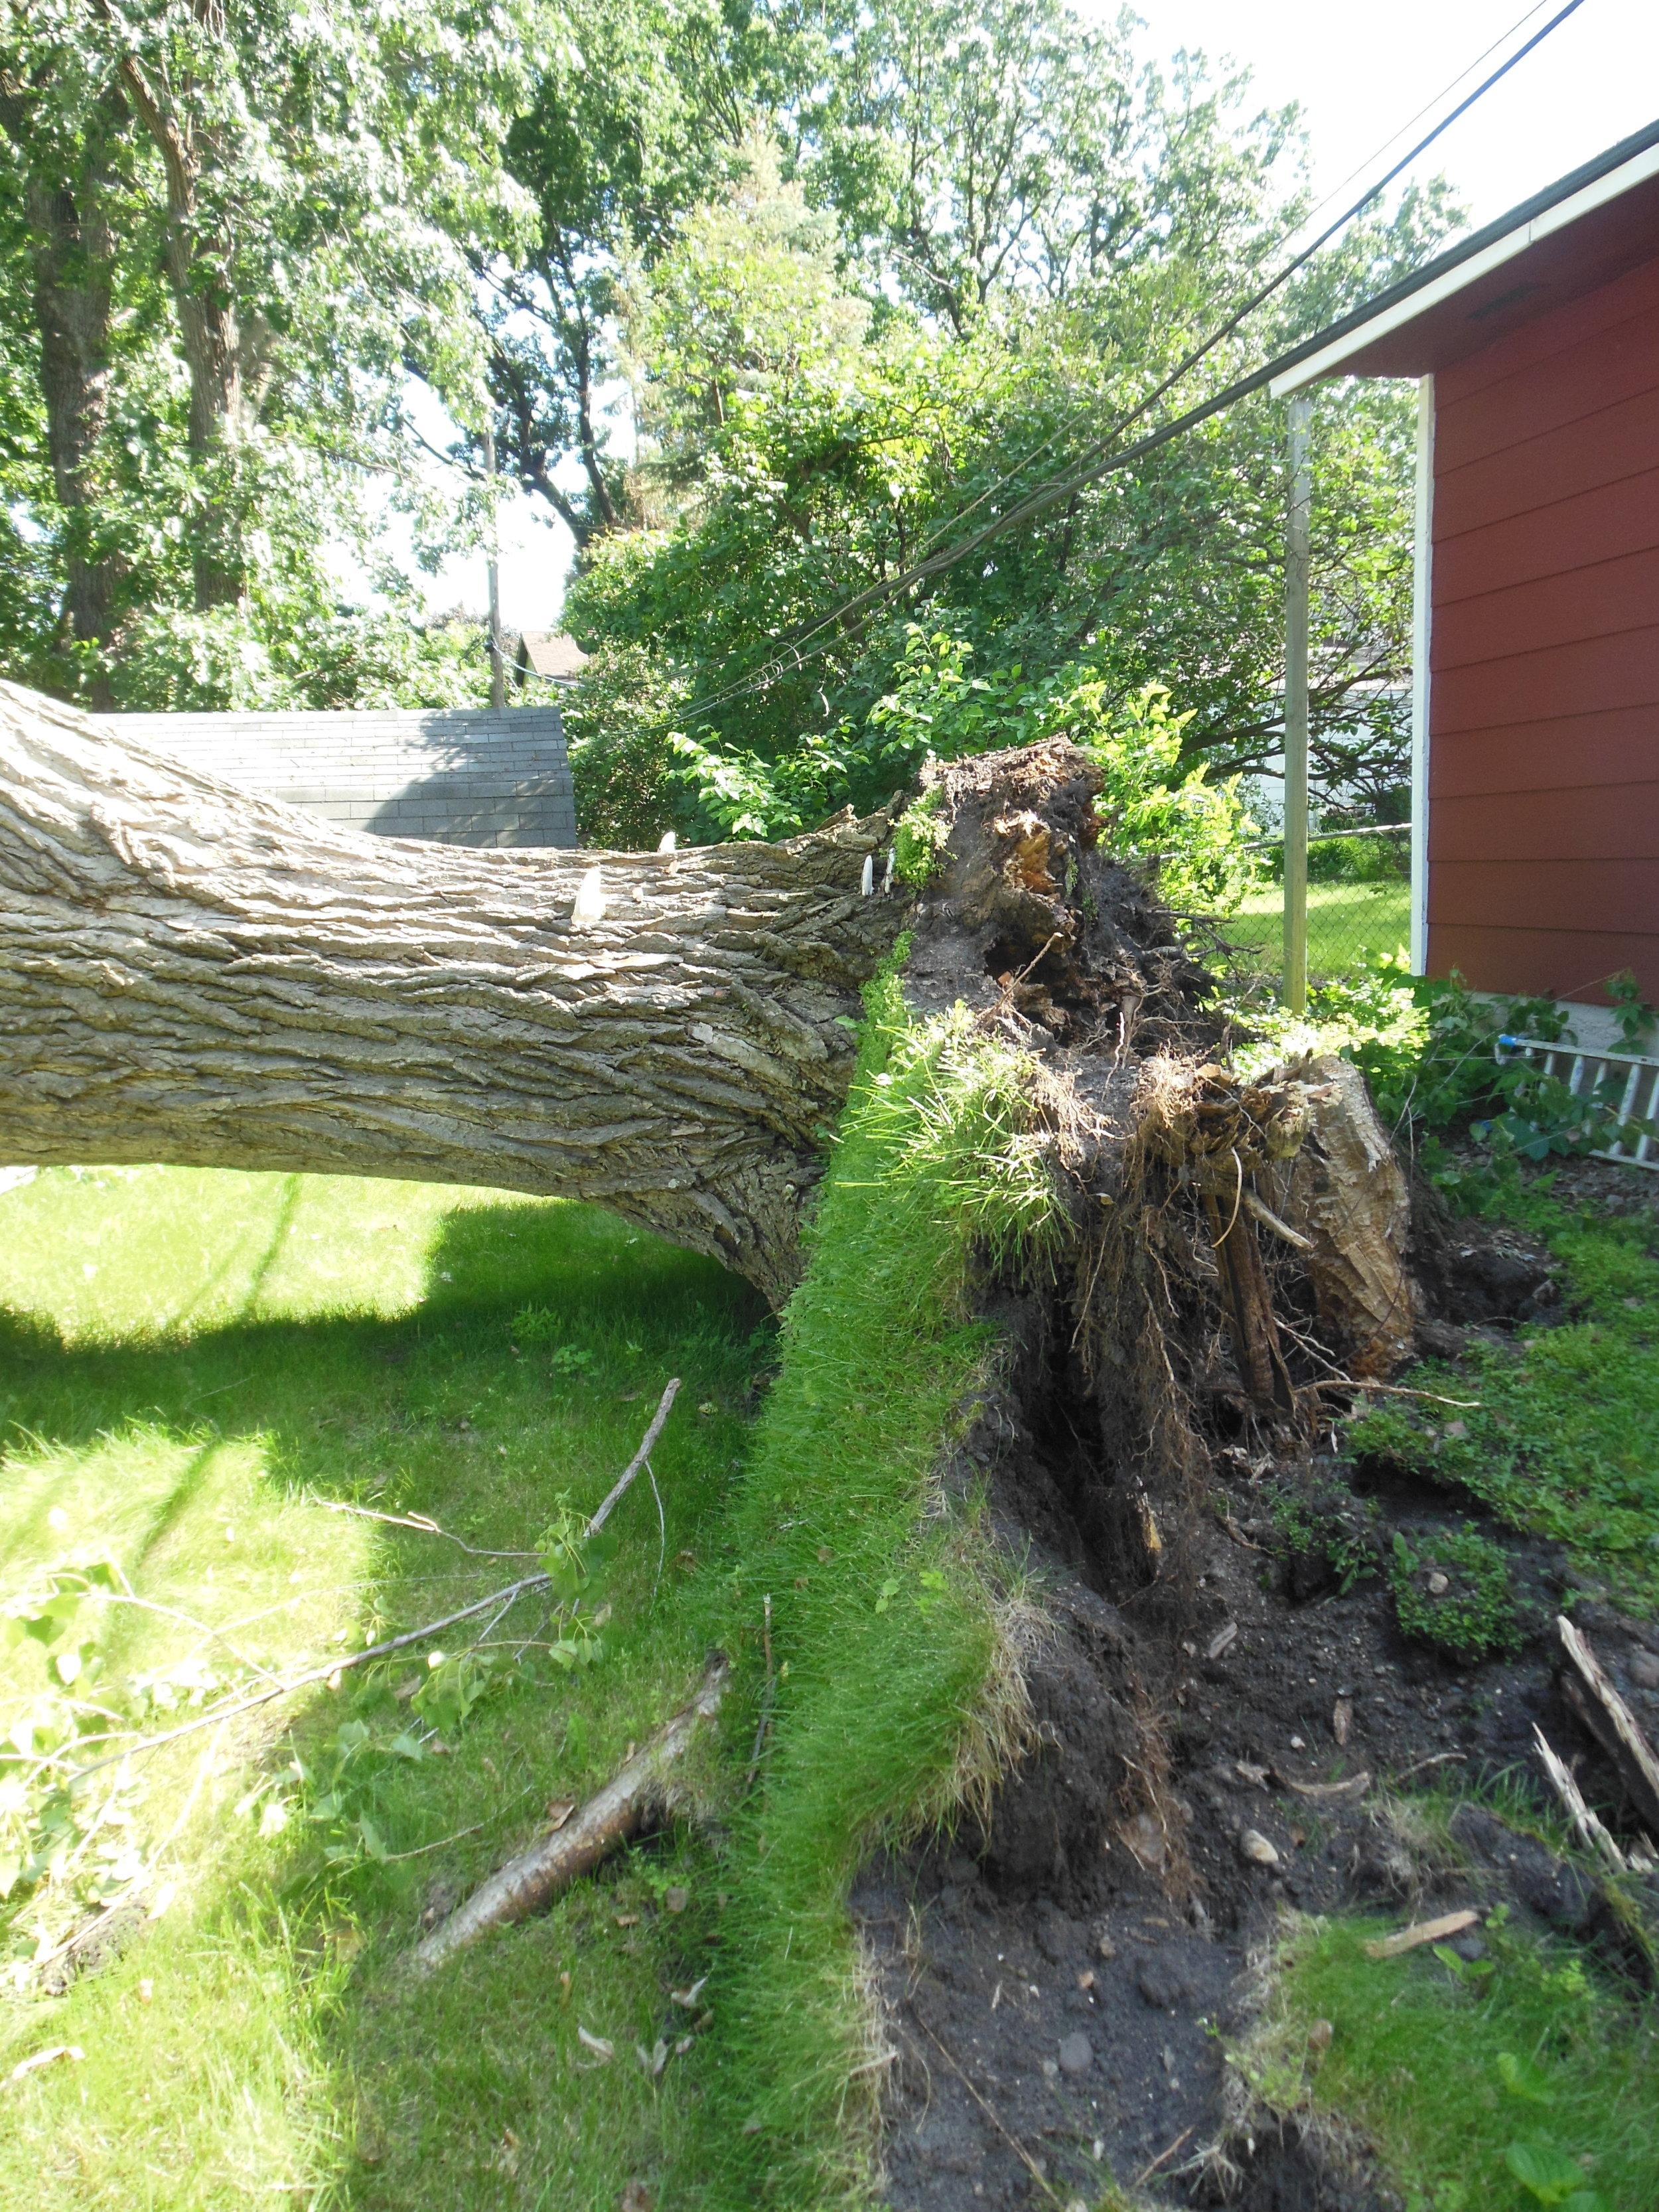 Shadywood Tree Experts